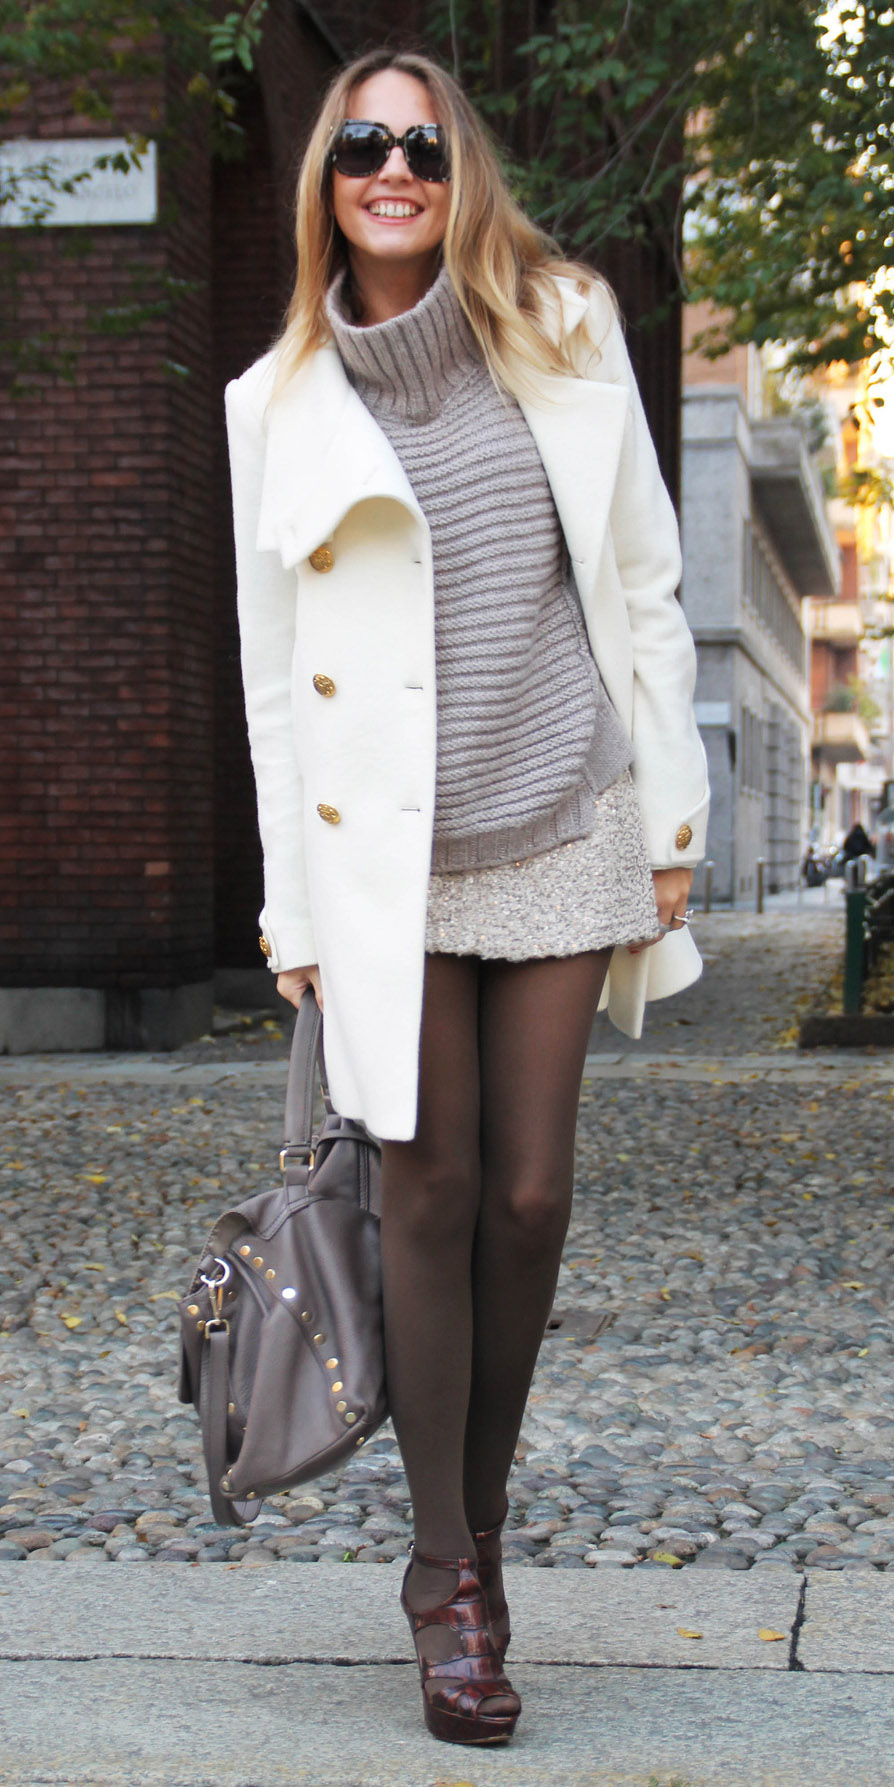 grayl-mini-skirt-grayl-sweater-turtleneck-brown-tights-brown-shoe-sandalh-gray-bag-blonde-white-jacket-coat-peacoat-fall-winter-dinner.jpg